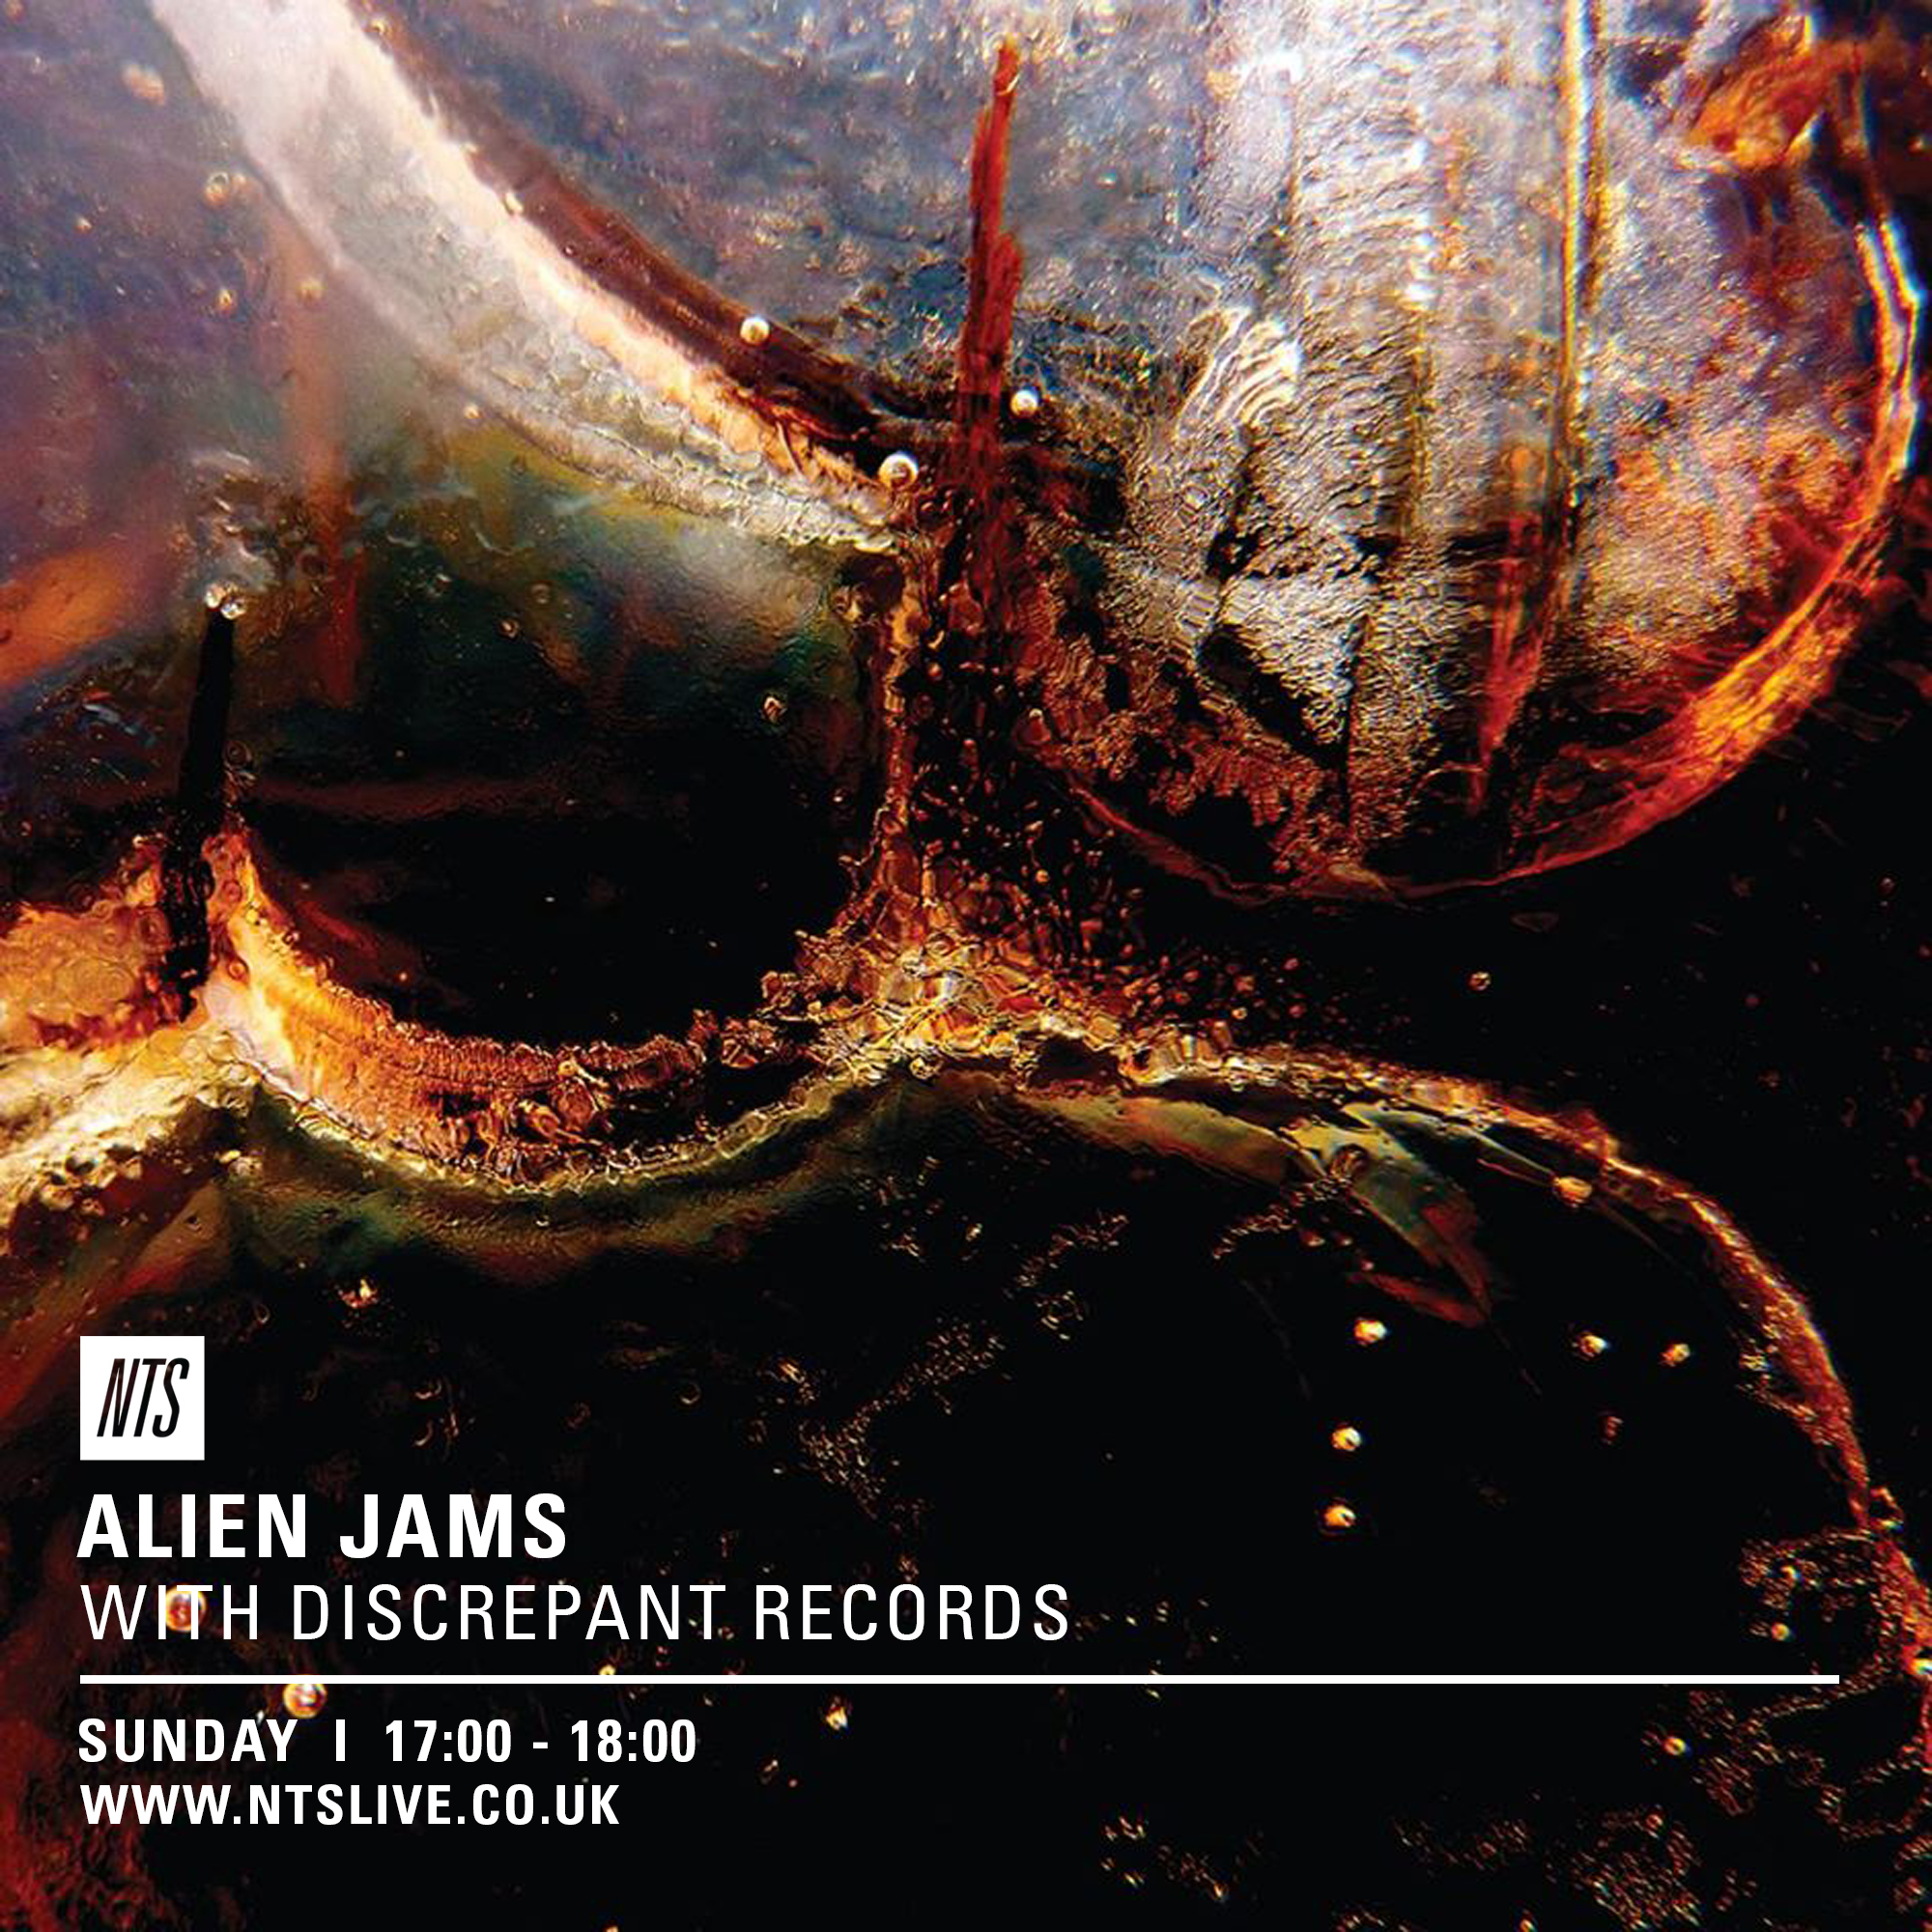 Alien Jams with Discrepant